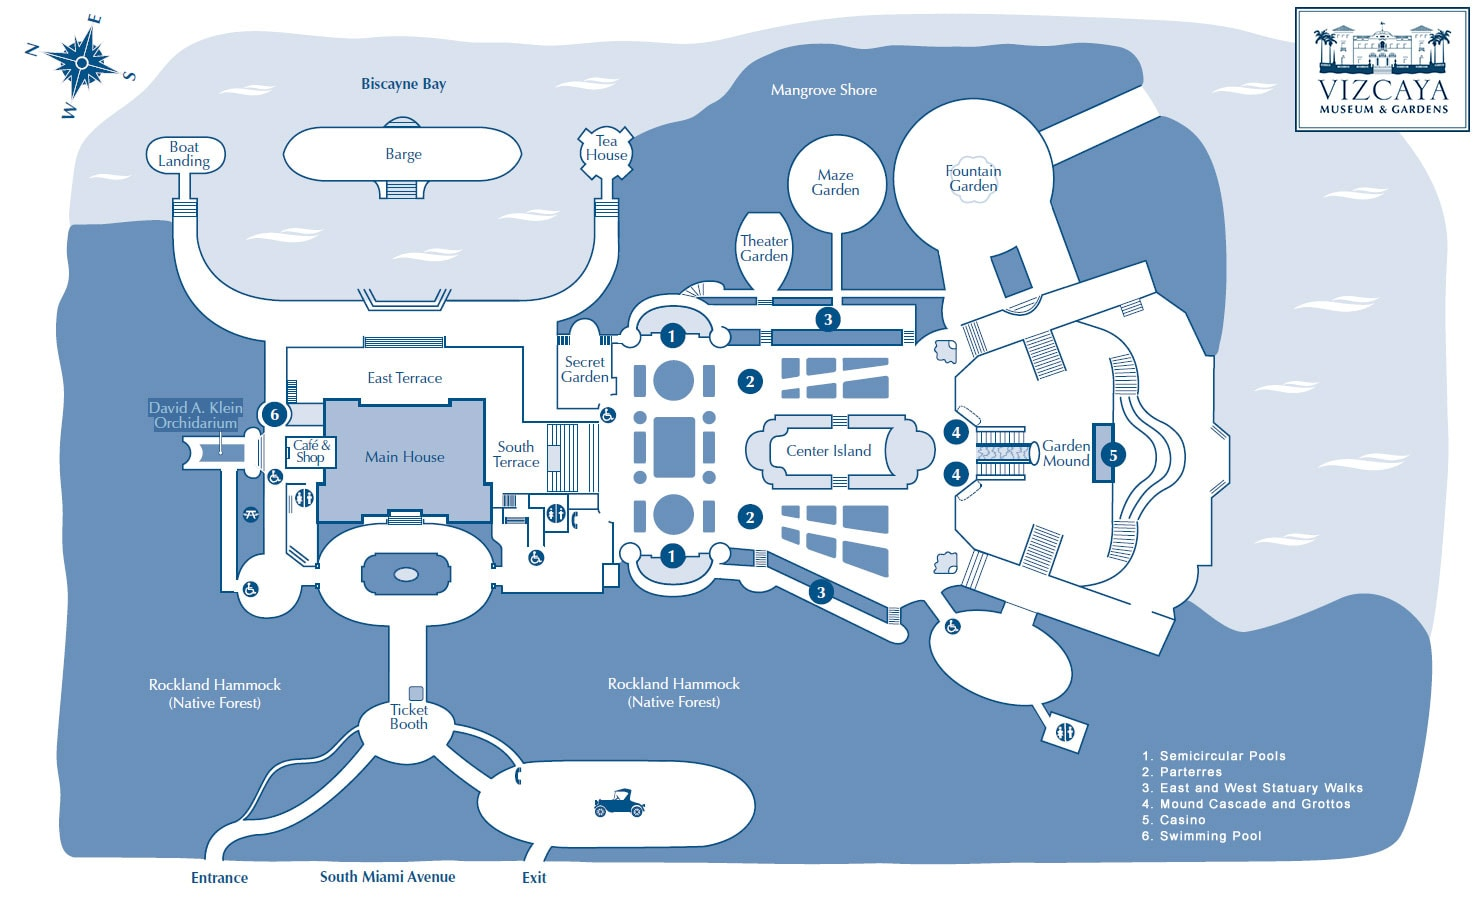 Map, Map. Site Map, Vizcaya Museum & Gardens, Travelreport